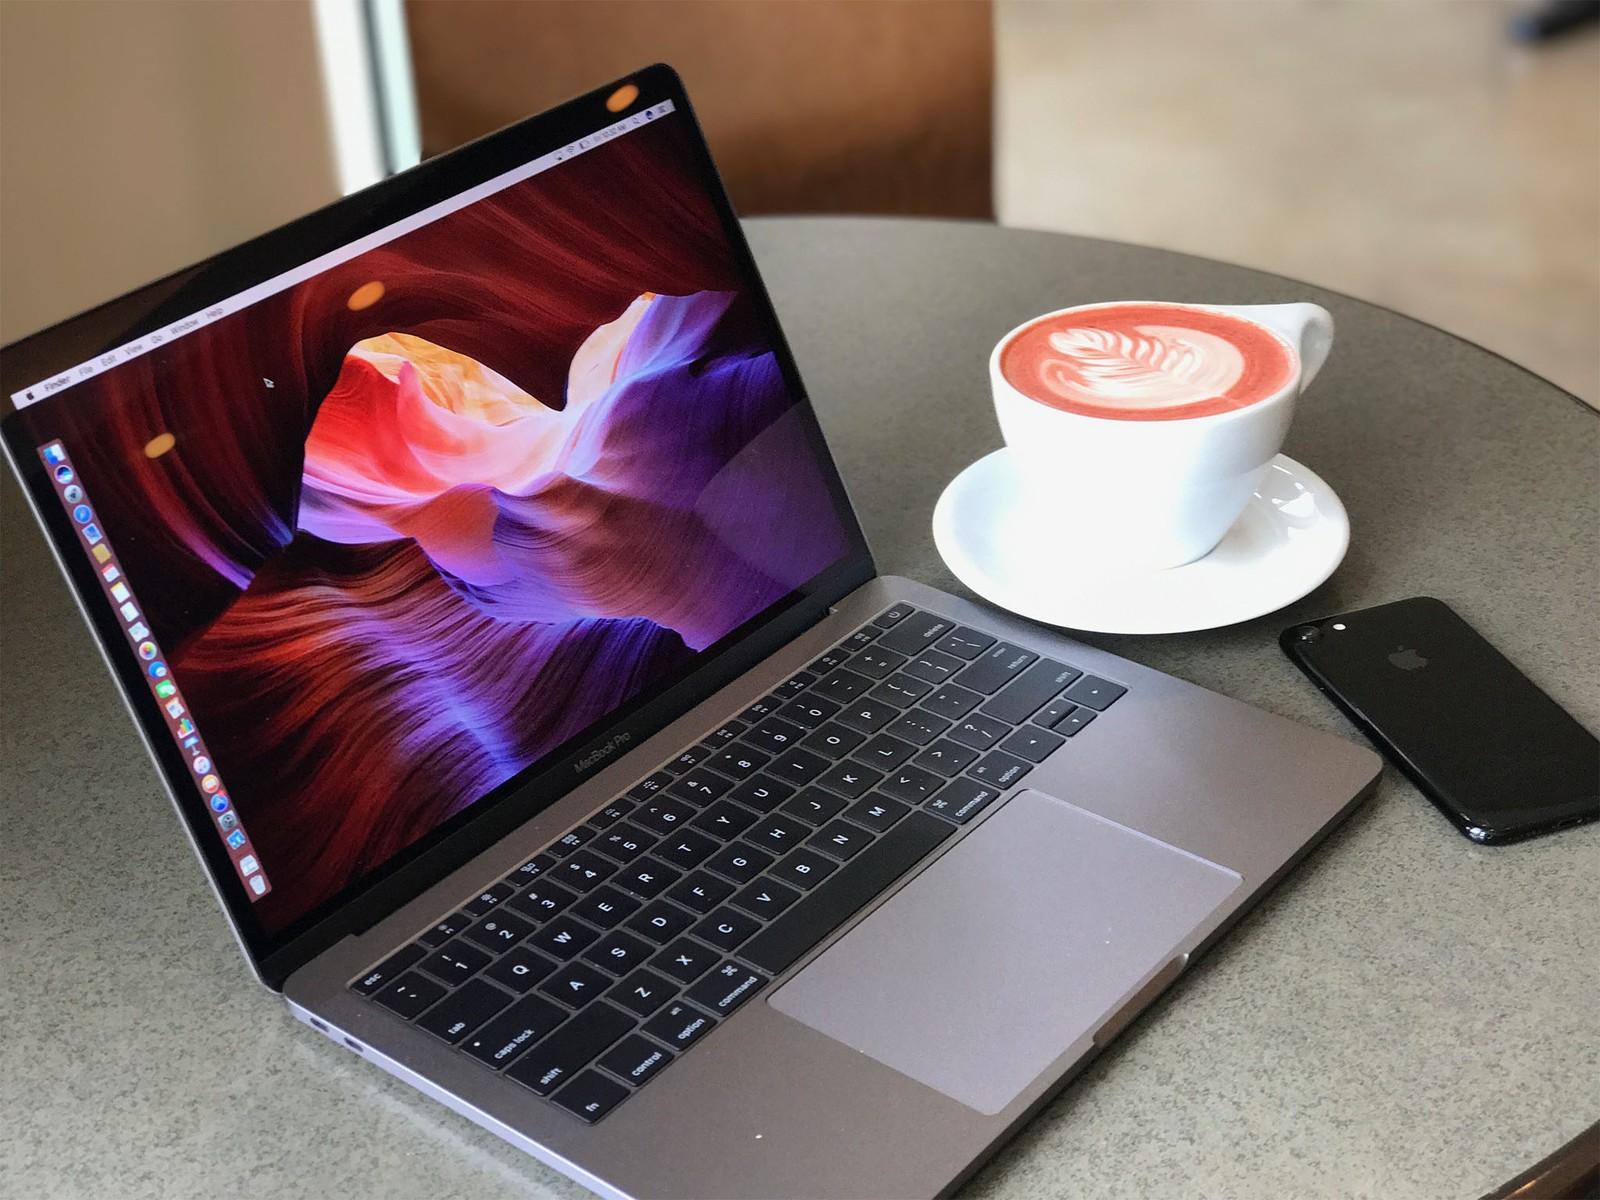 Apple признала проблемы с SSD в MacBook Pro 13 - 1